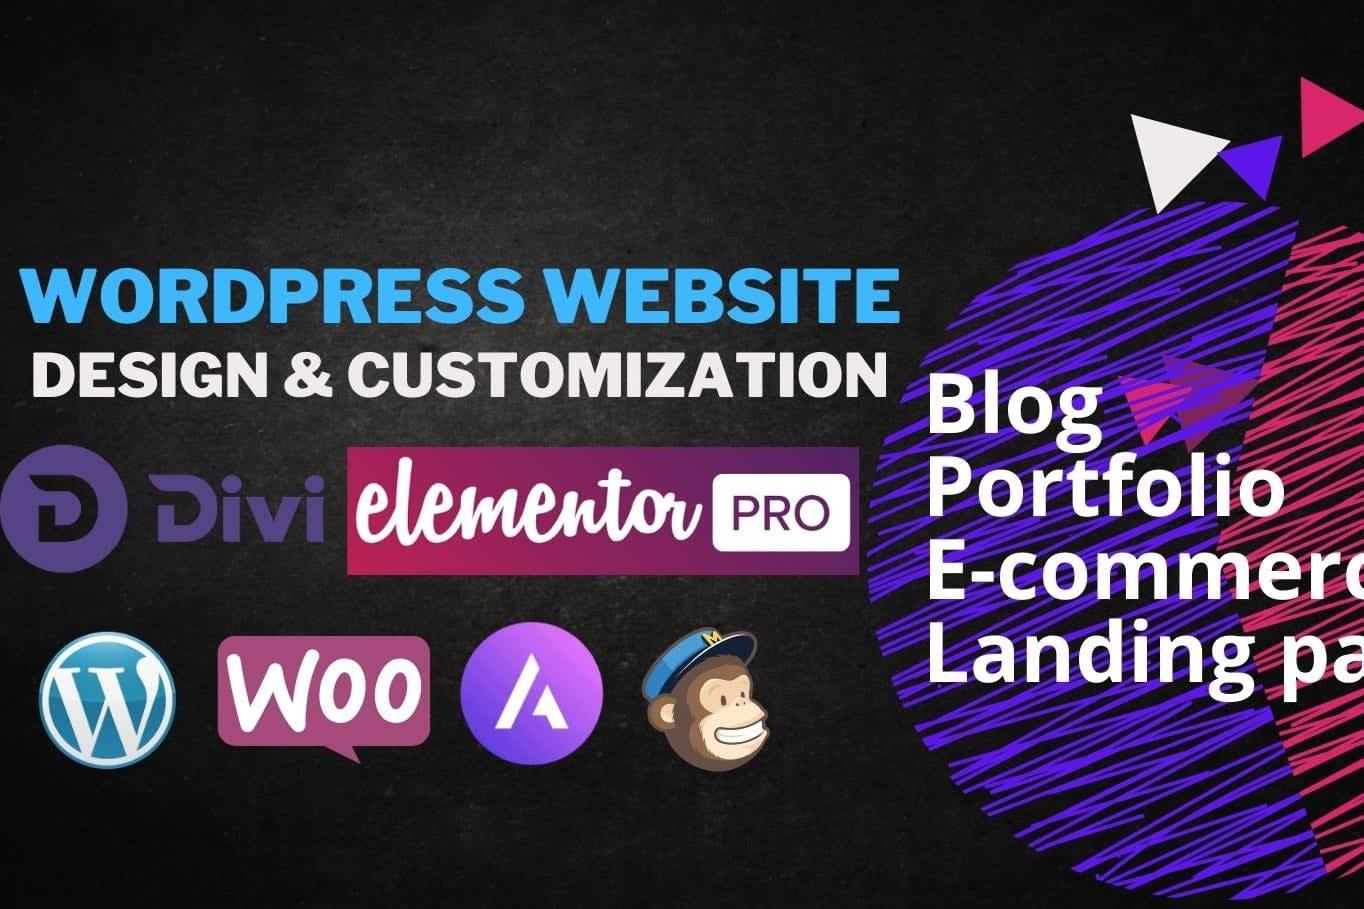 Portfolio for Web development and Wordpress